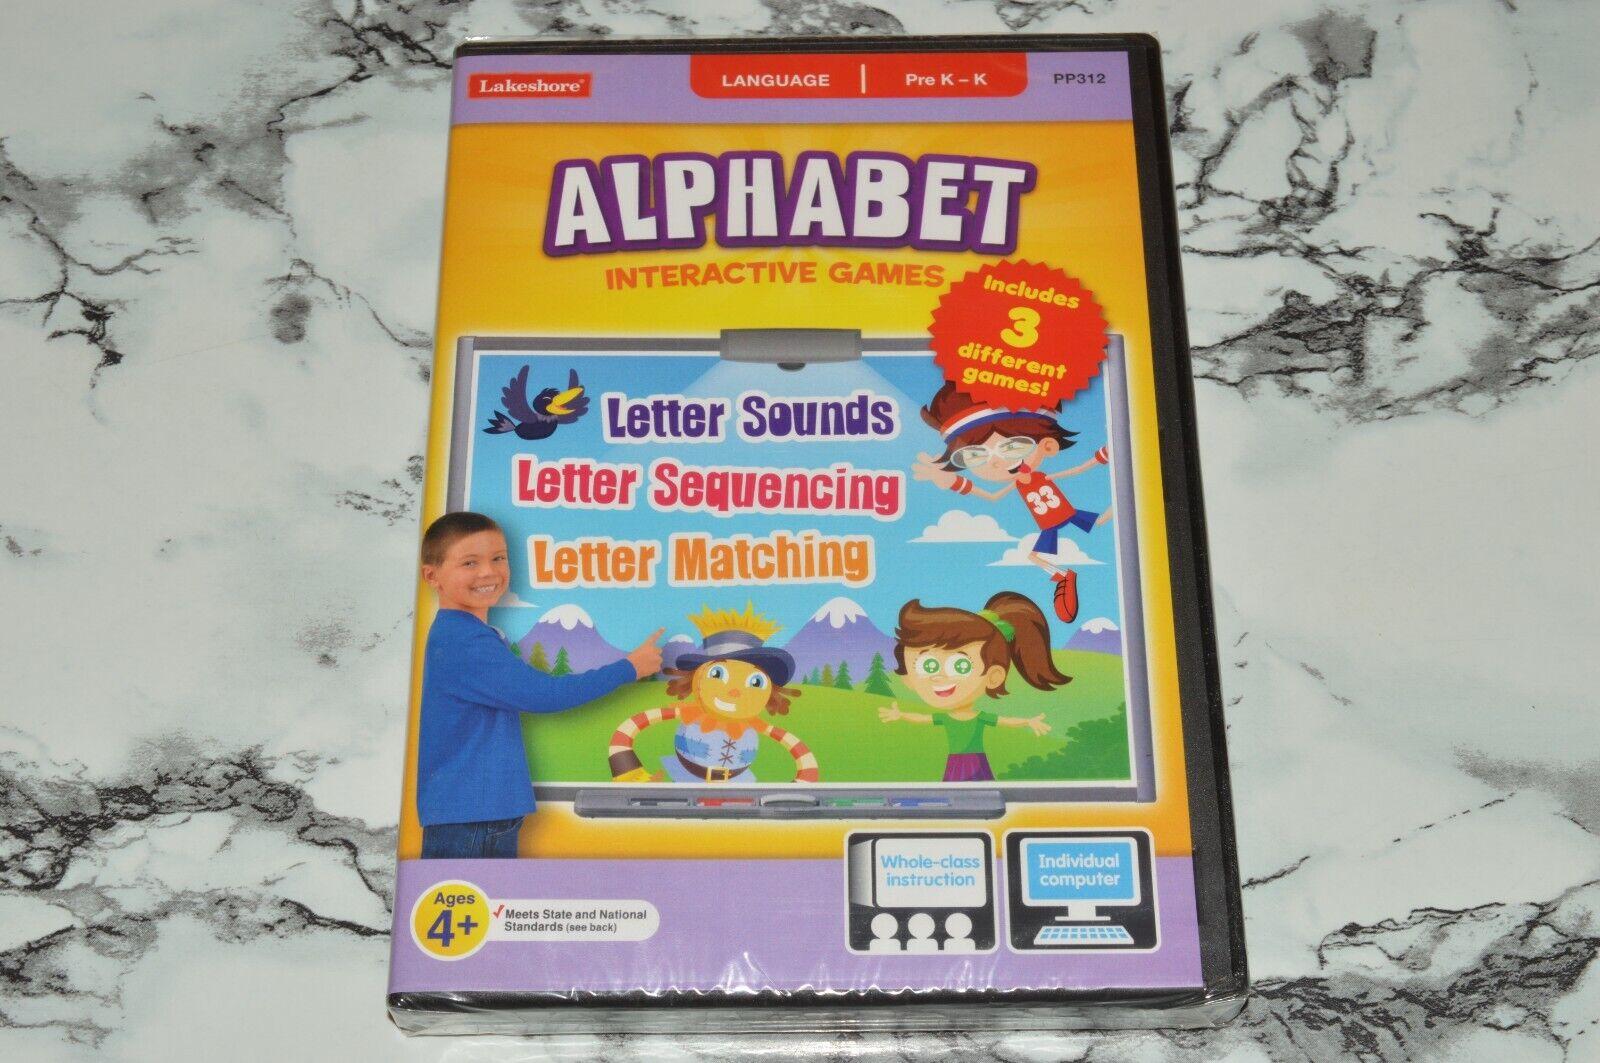 NEW - Lakeshore - Alphabet Interactive Games - Language PC / MAC CD-ROM  - $12.68